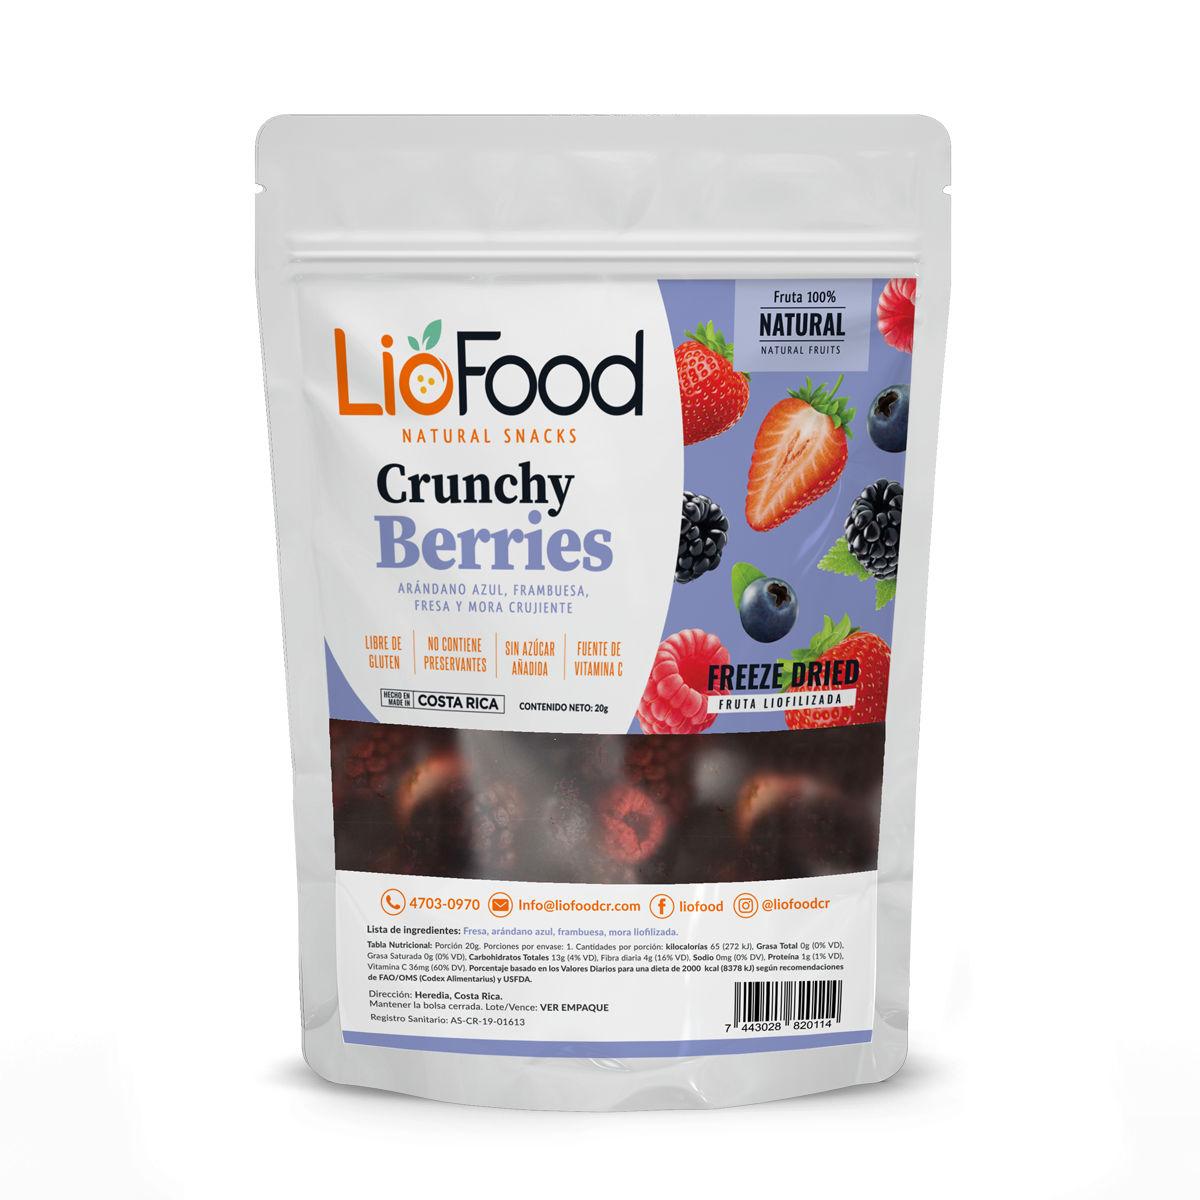 Crunchy Berries